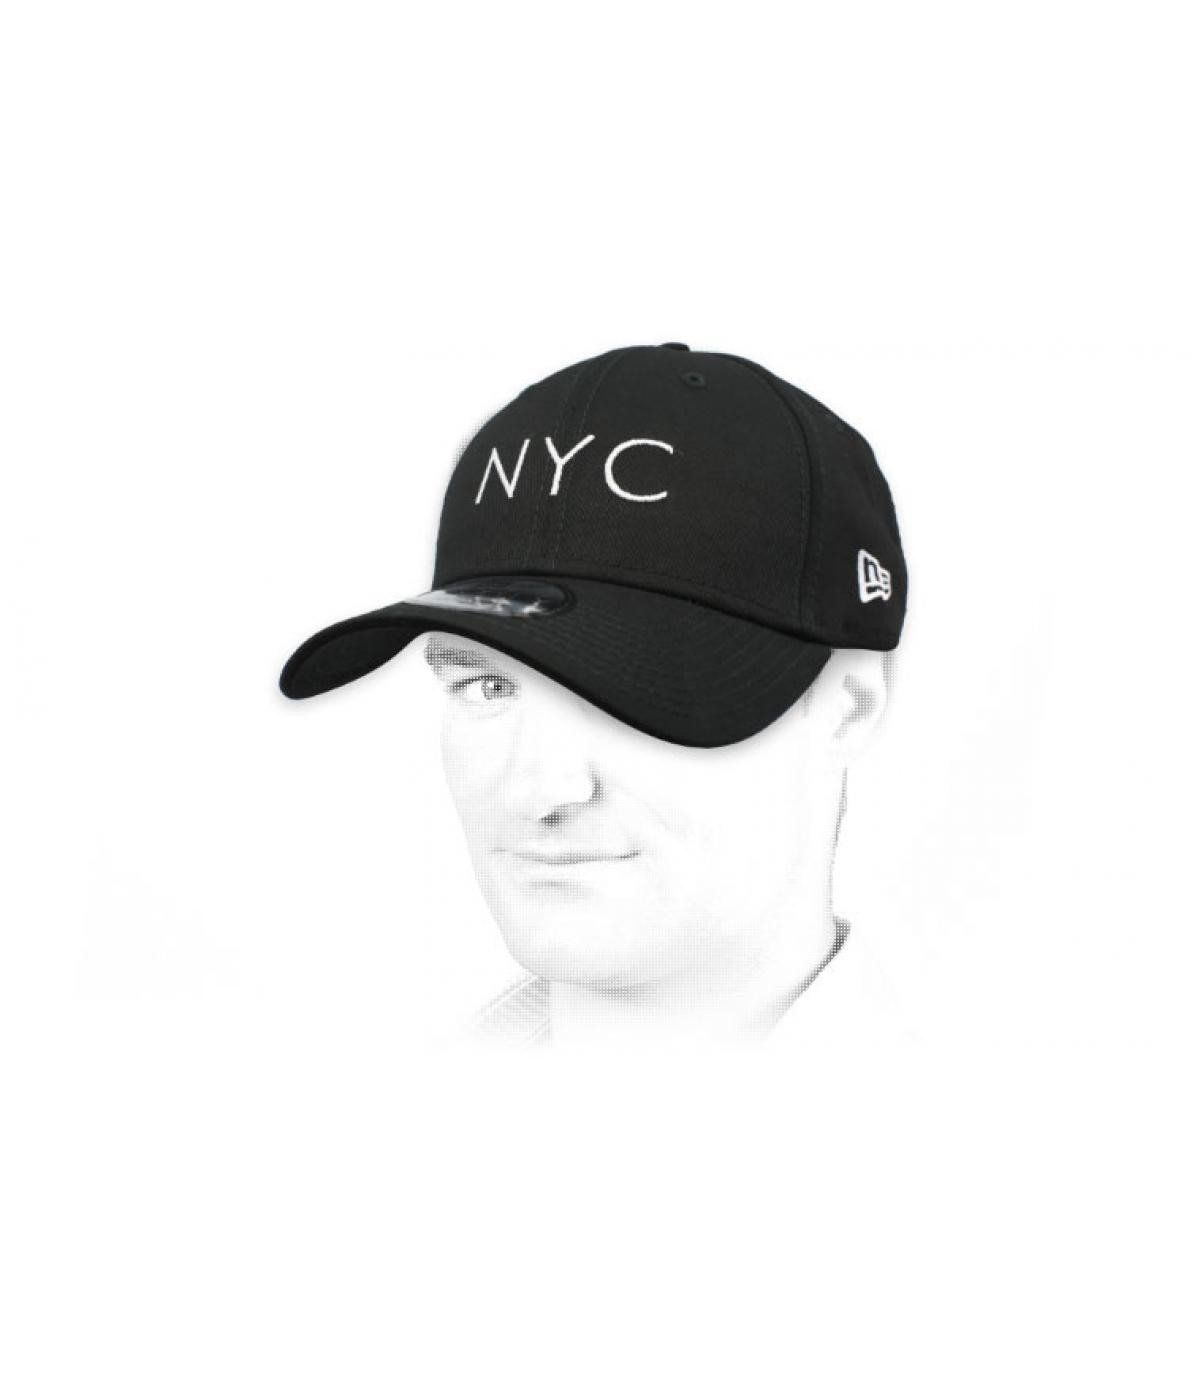 black NYC cap